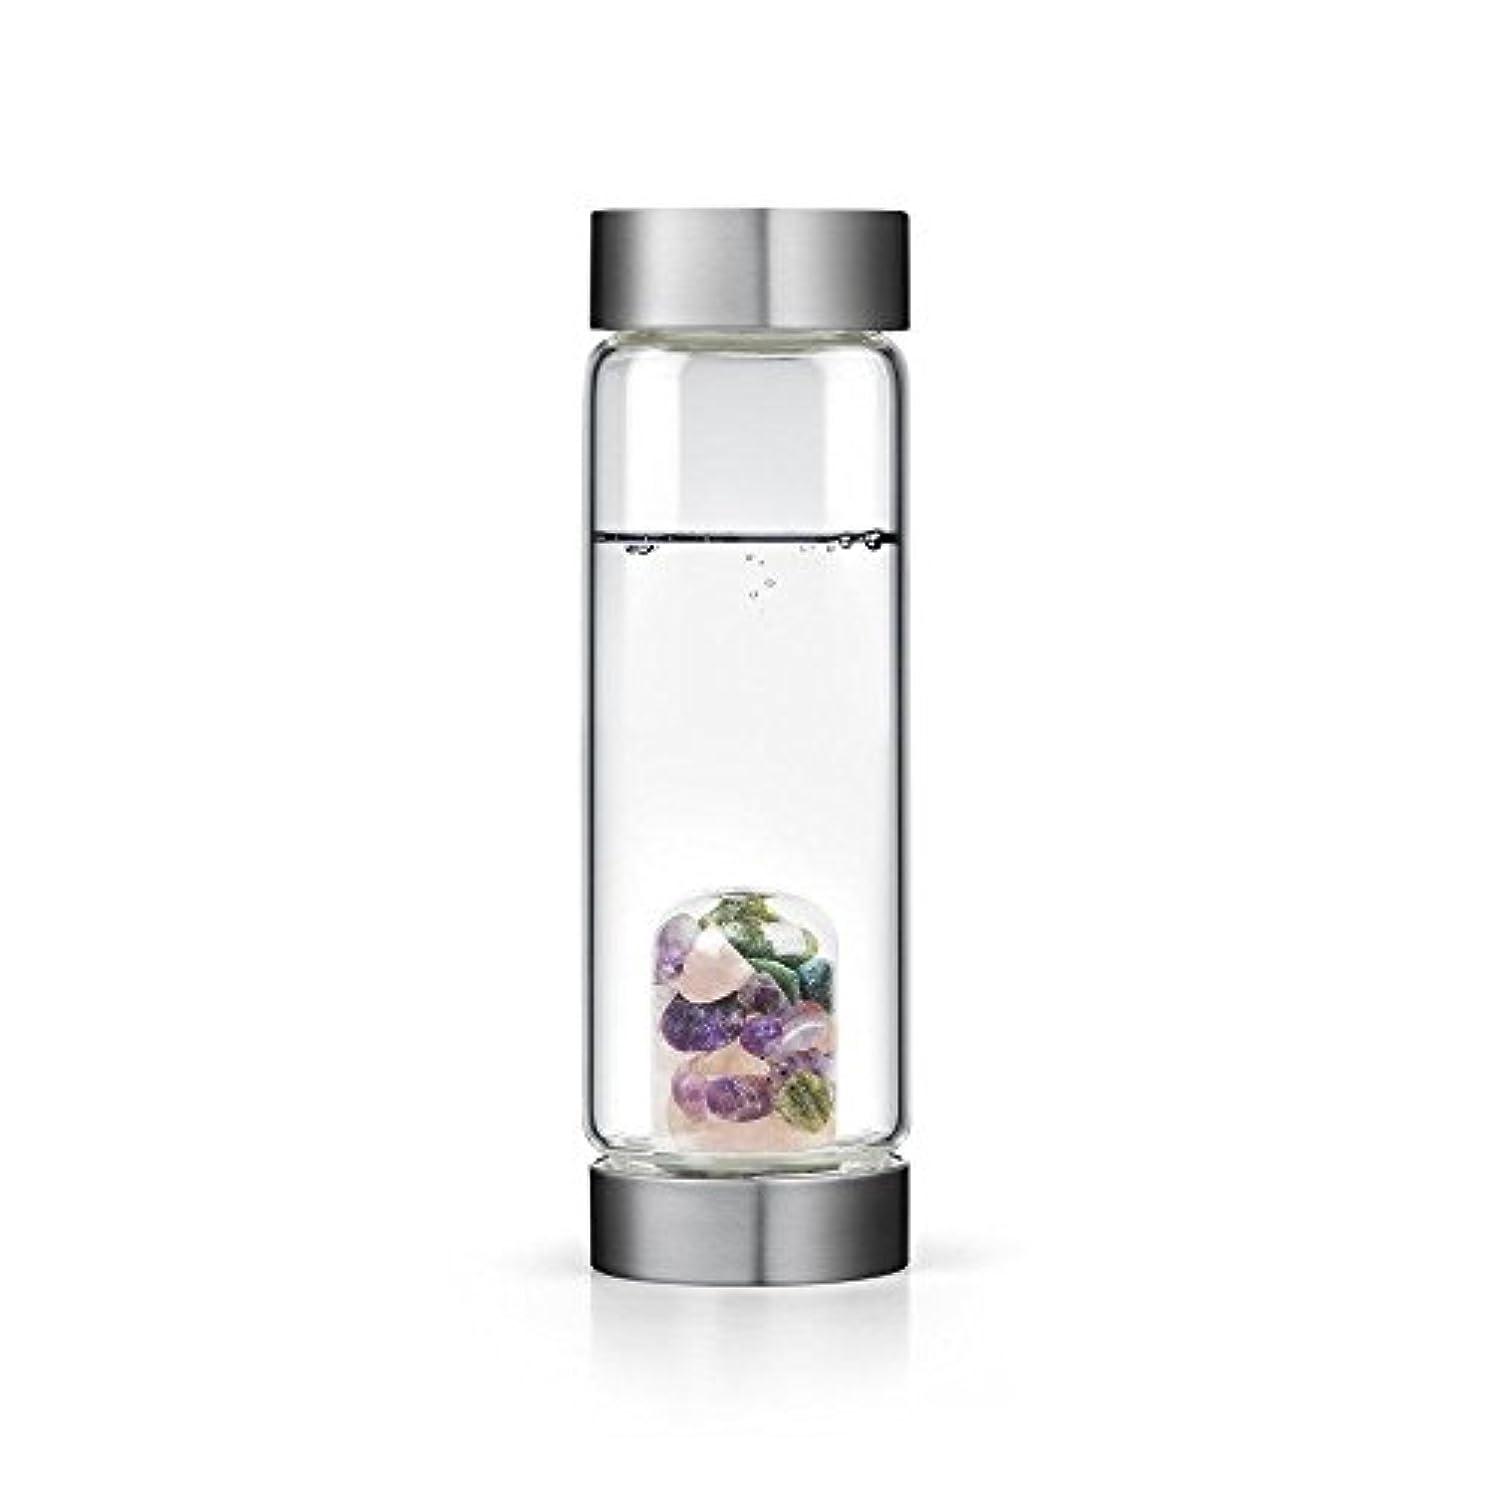 Beauty gem-waterボトルby VitaJuwel W / Freeカリフォルニアホワイトセージバンドル 16.9 fl oz